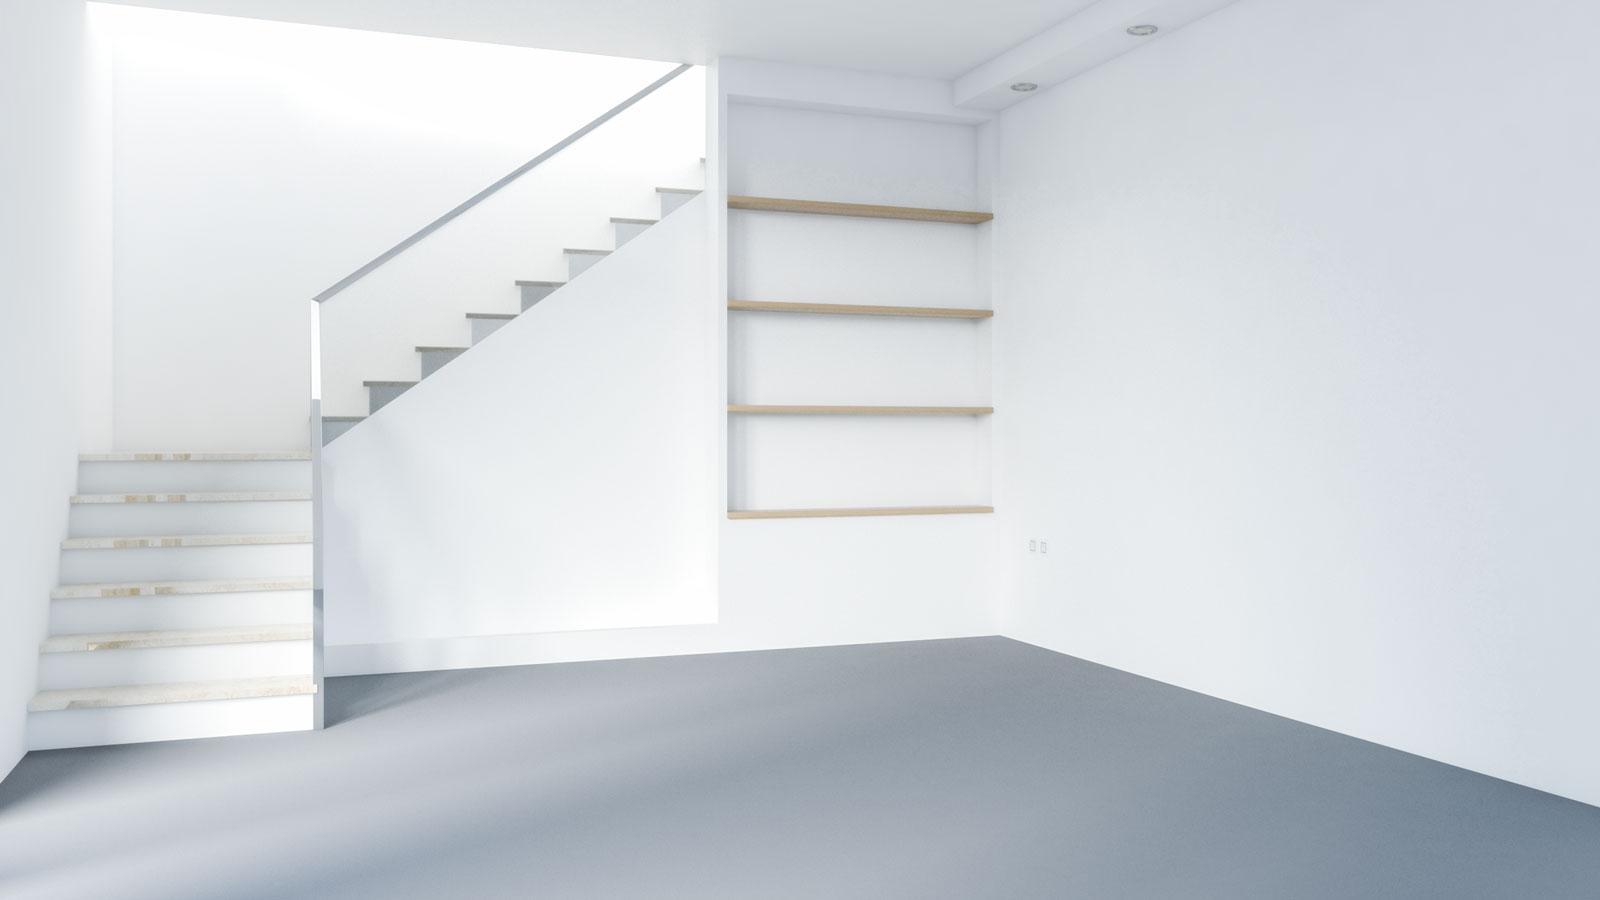 Medium gray carpet with white walls